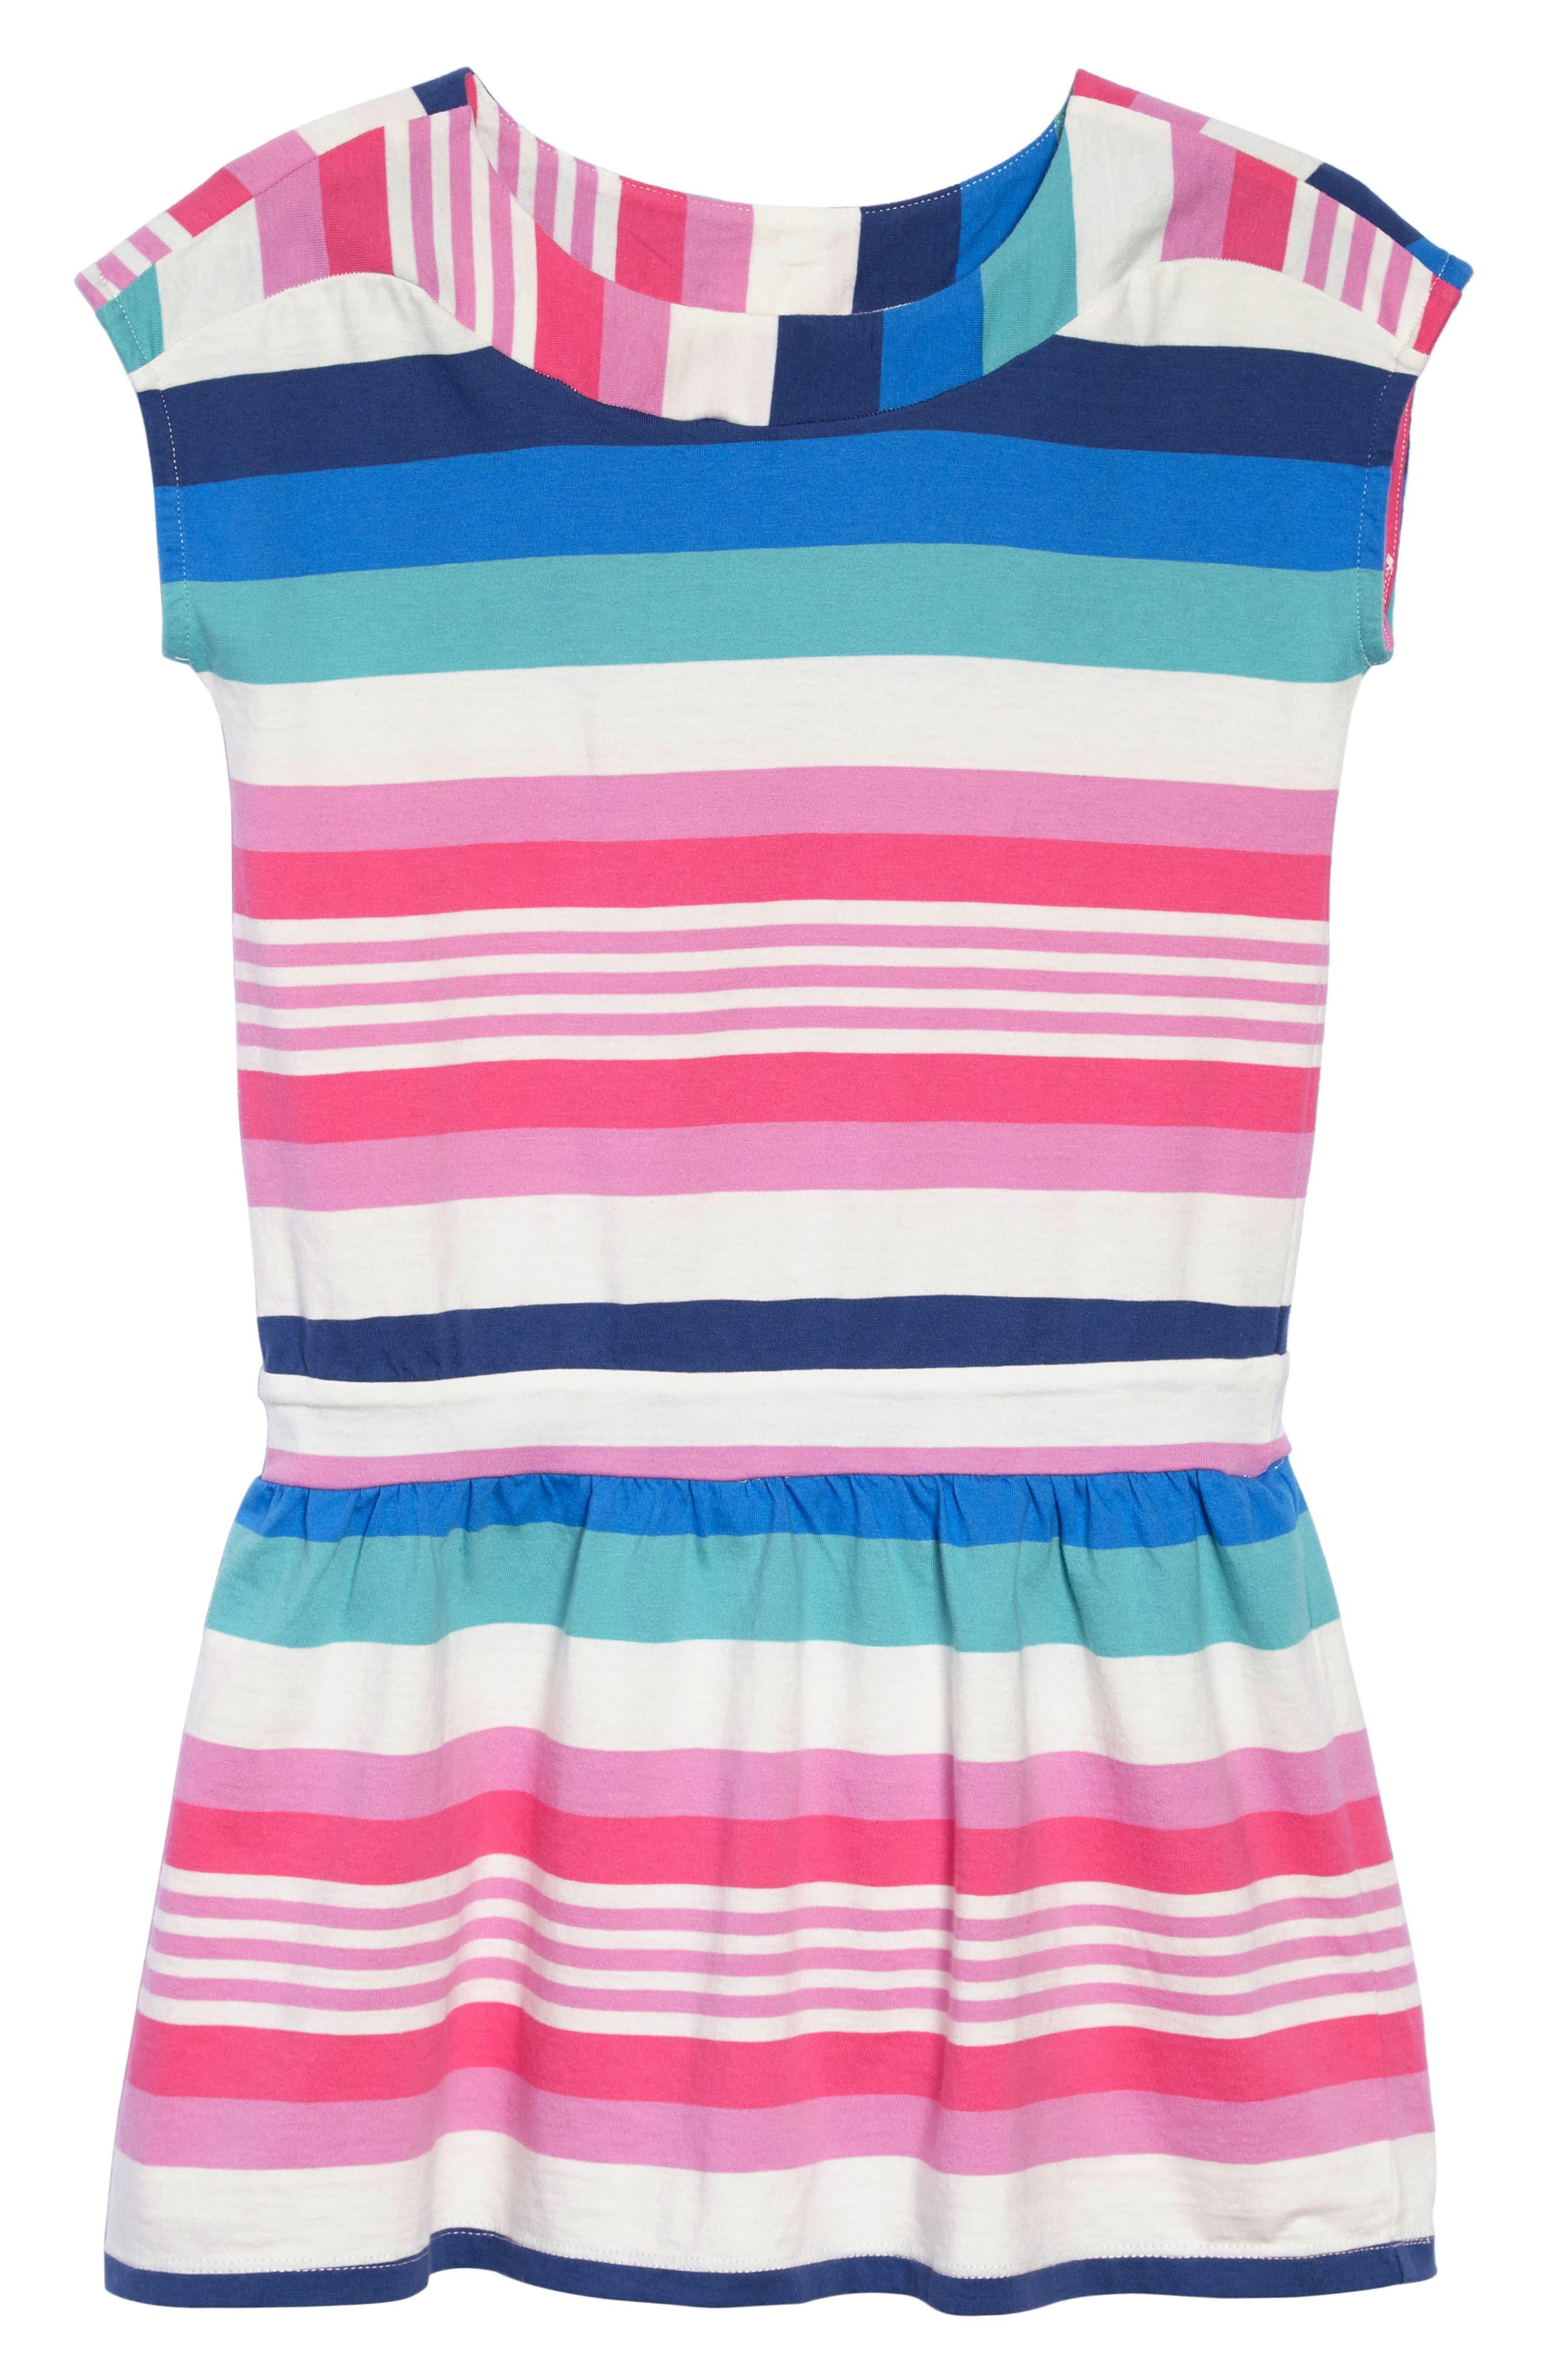 Alternate Image 1 Selected - Tea Collection Summer Dress (Toddler Girls, Little Girls & Big Girls)